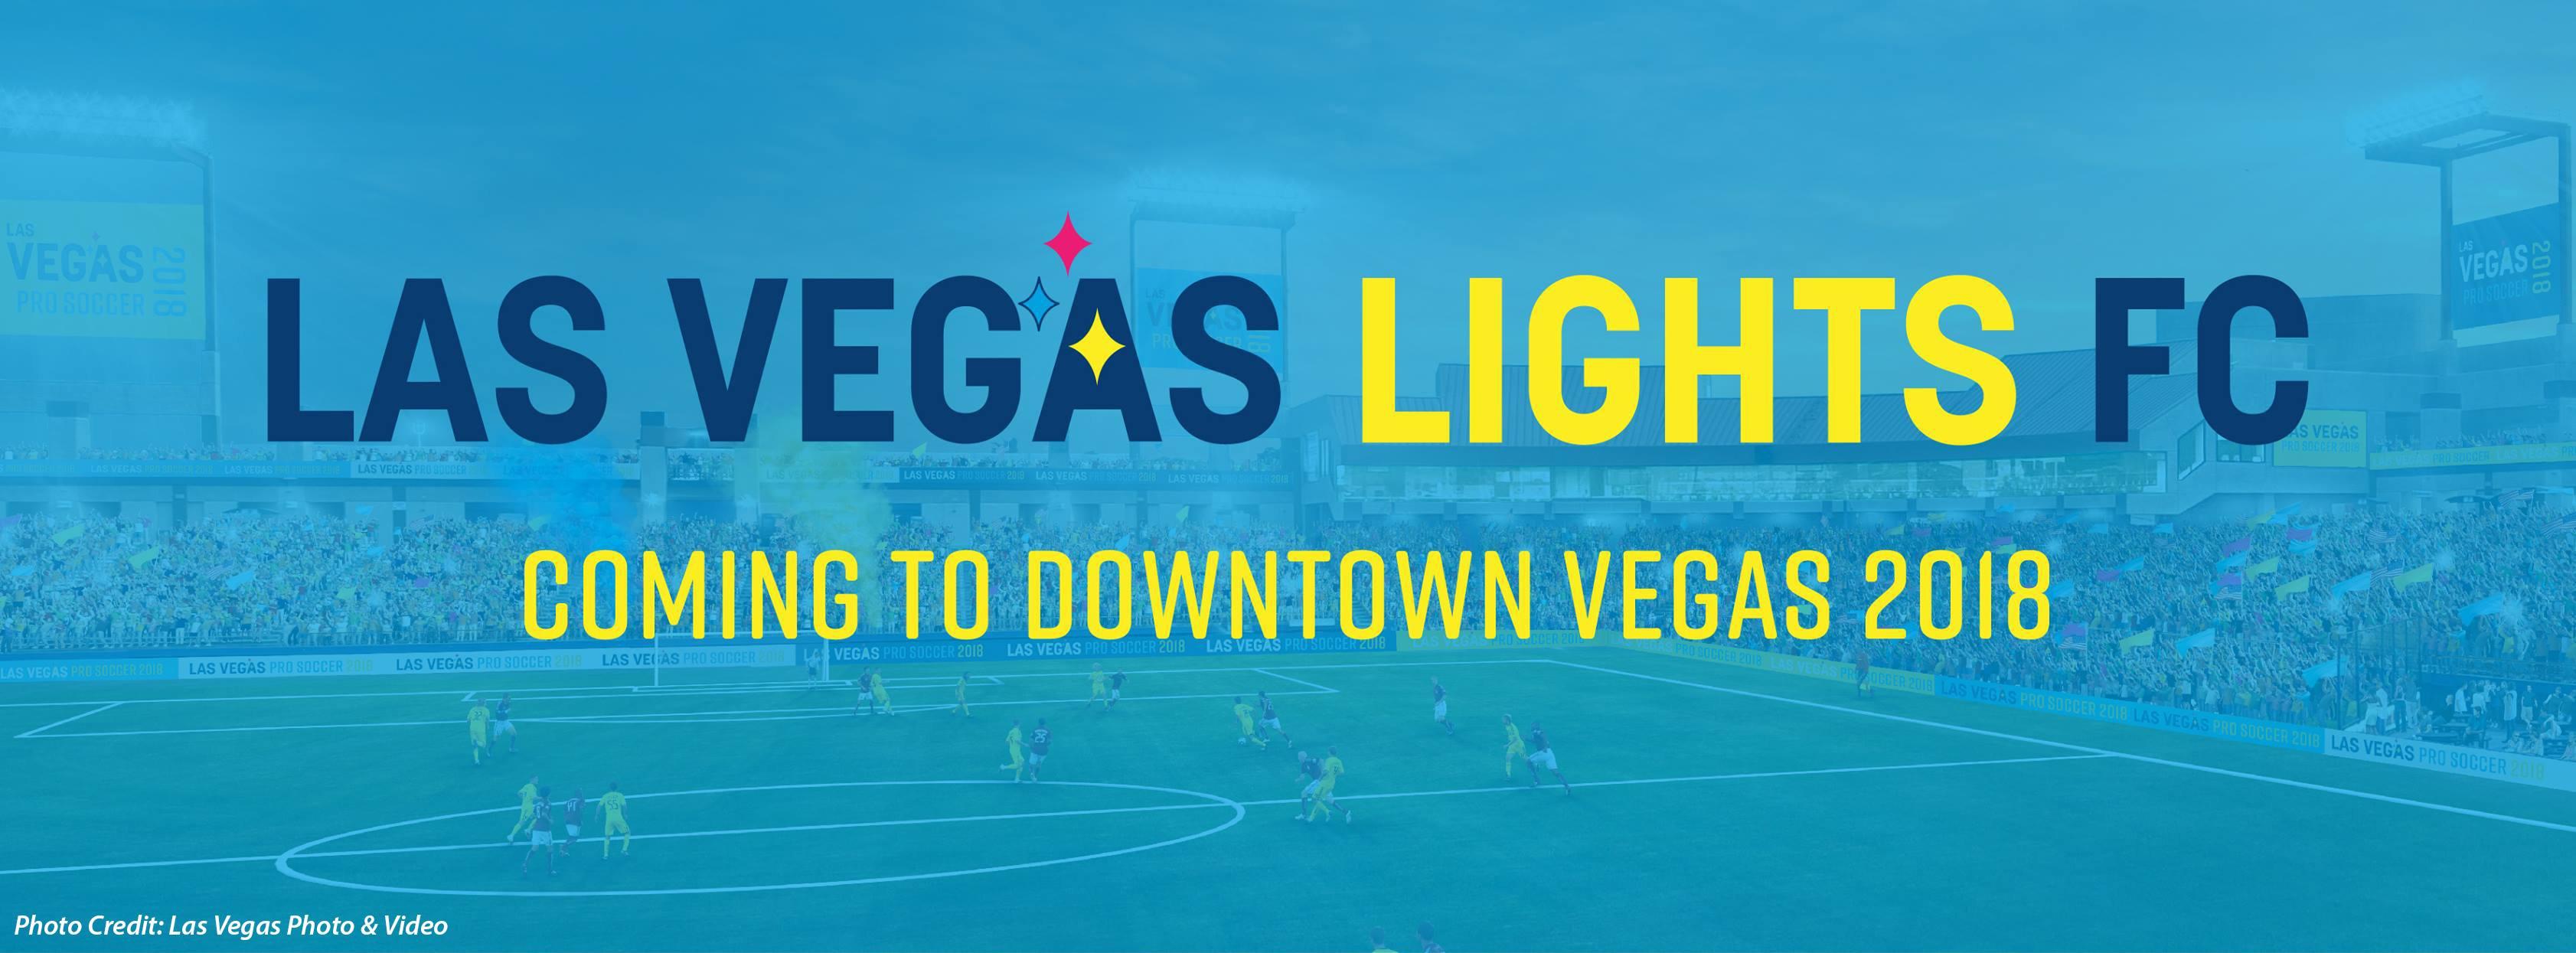 Las Vegas Lights Join The United Soccer League In 2018 Season -